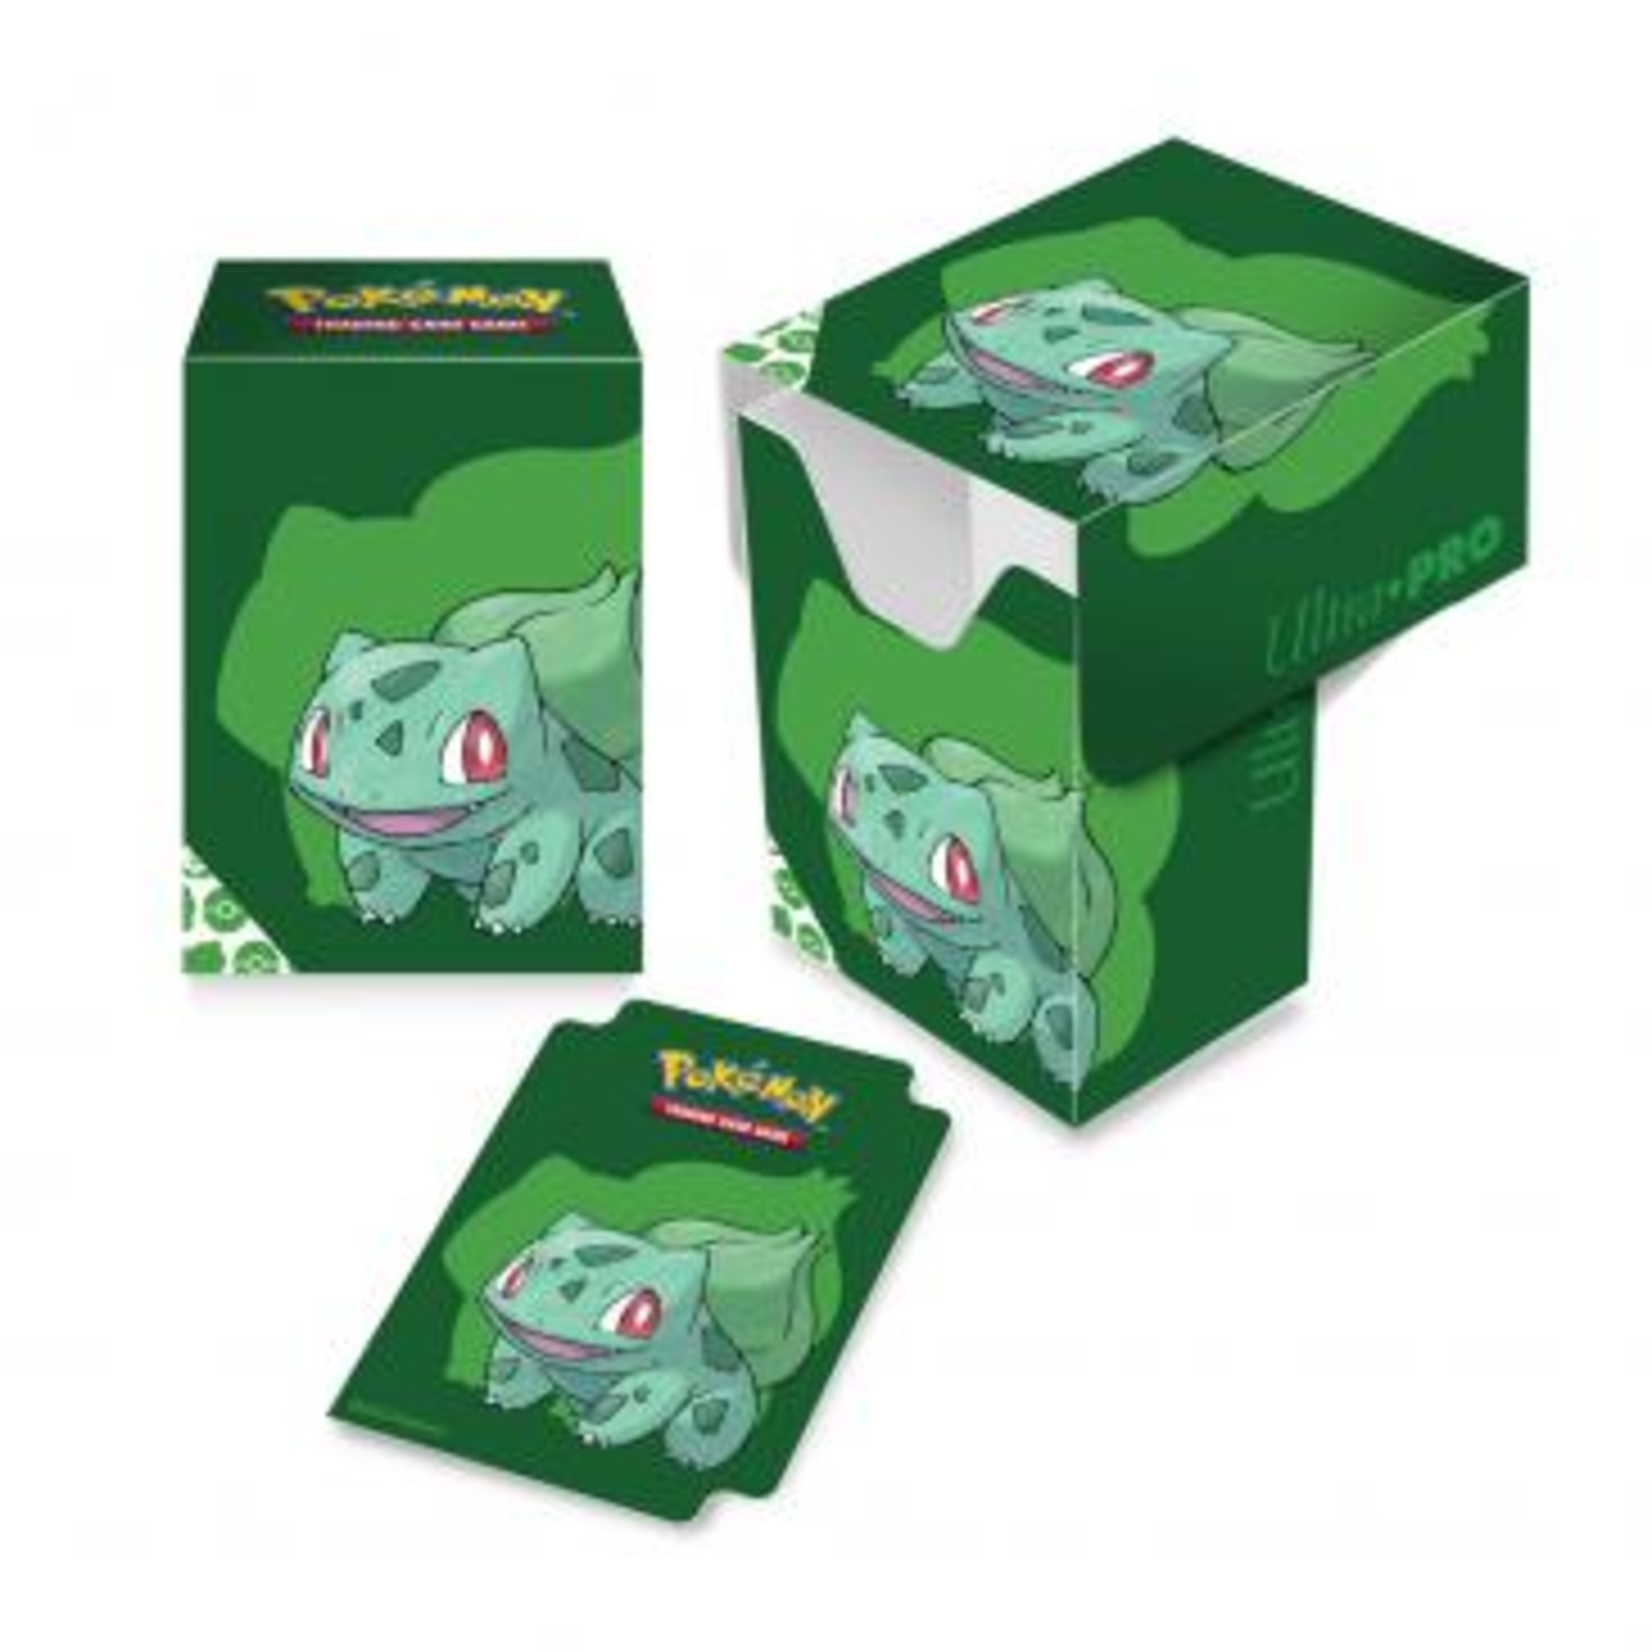 Ultra Pro Pokémon Deck Box: Bulbasaur